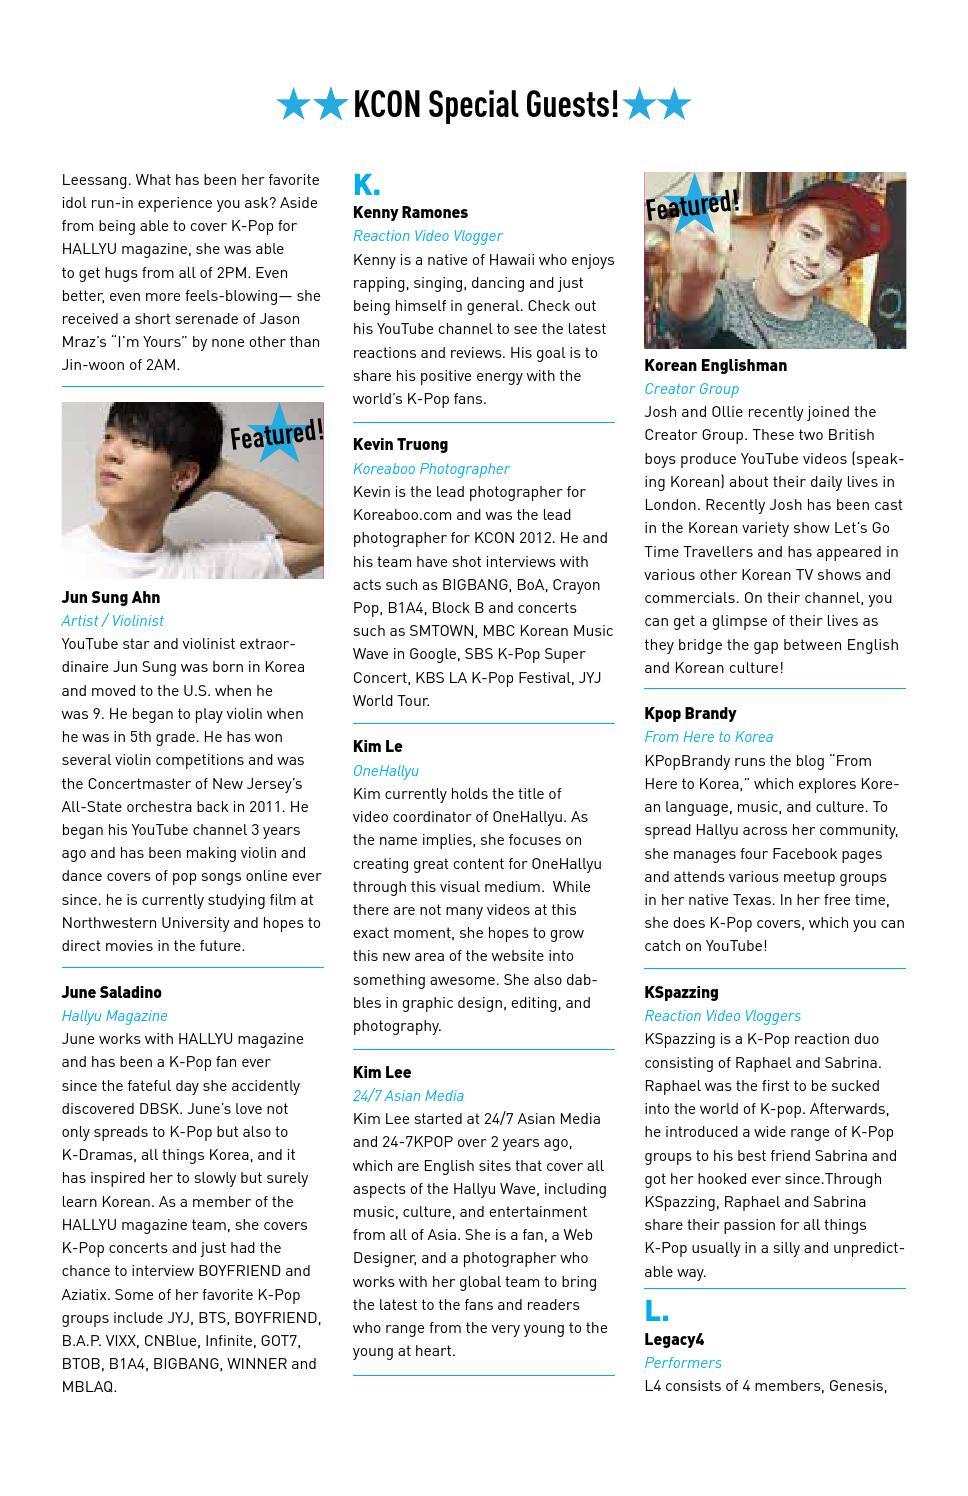 KCON 2014 Official Program Book by kconusa - issuu